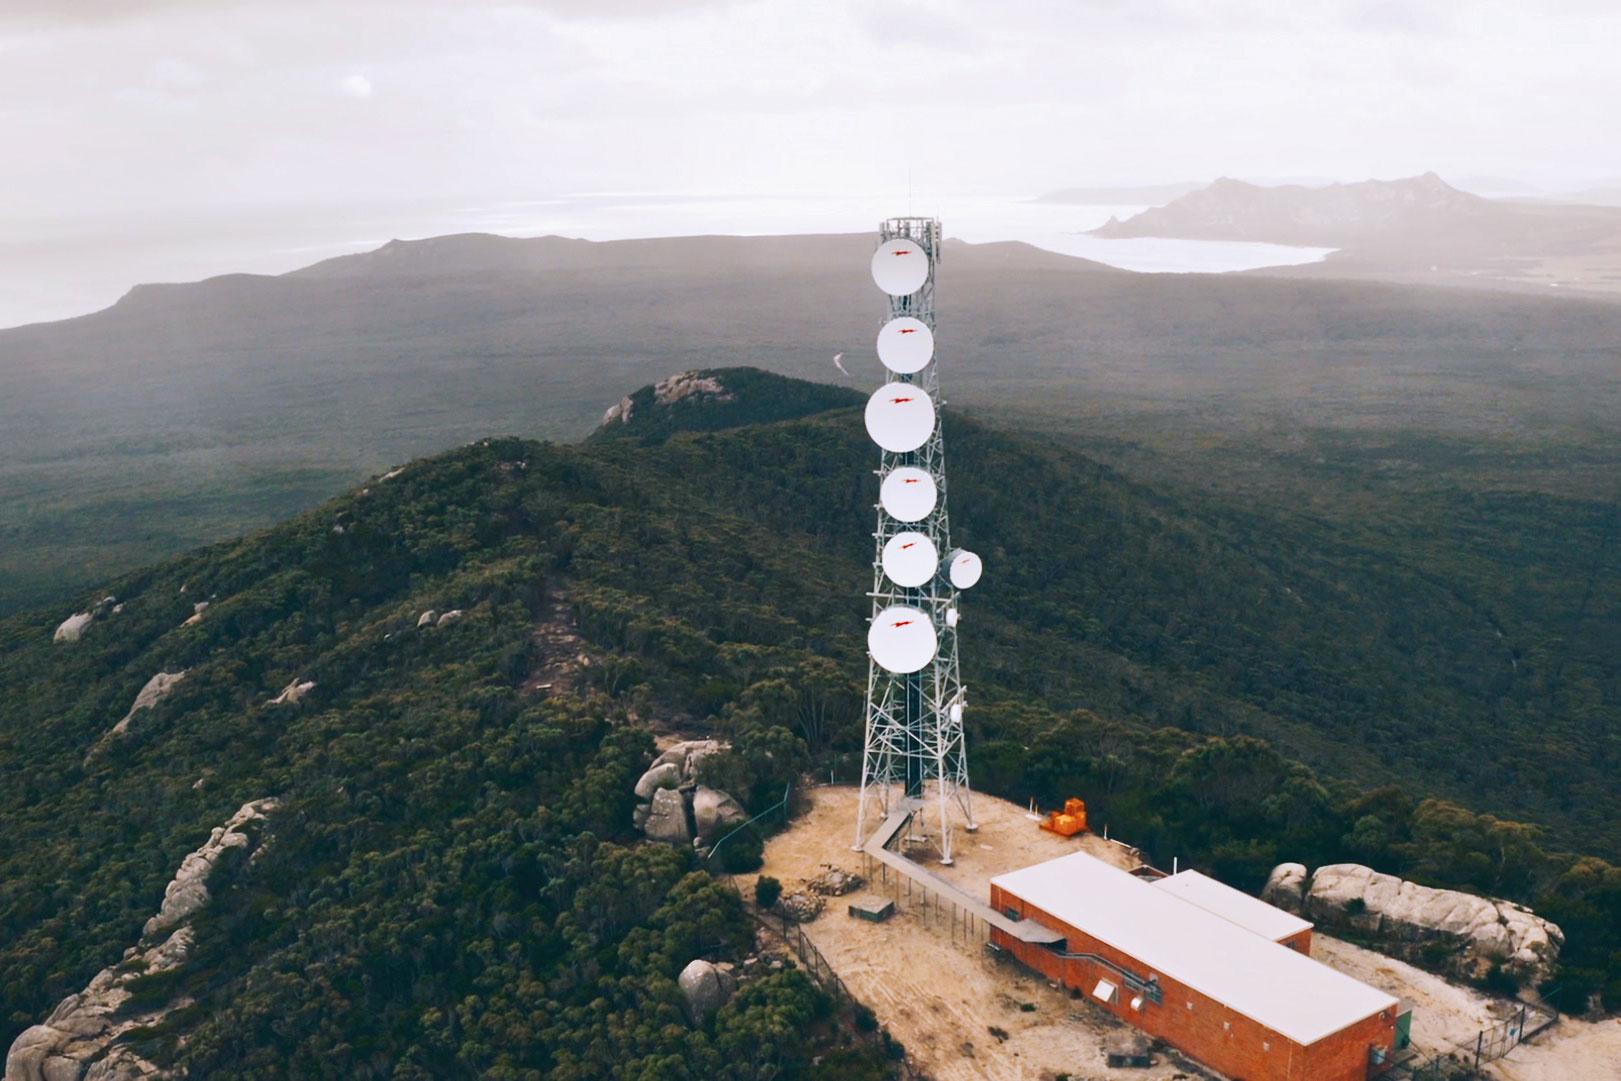 An Amplitel tower in an alpine setting